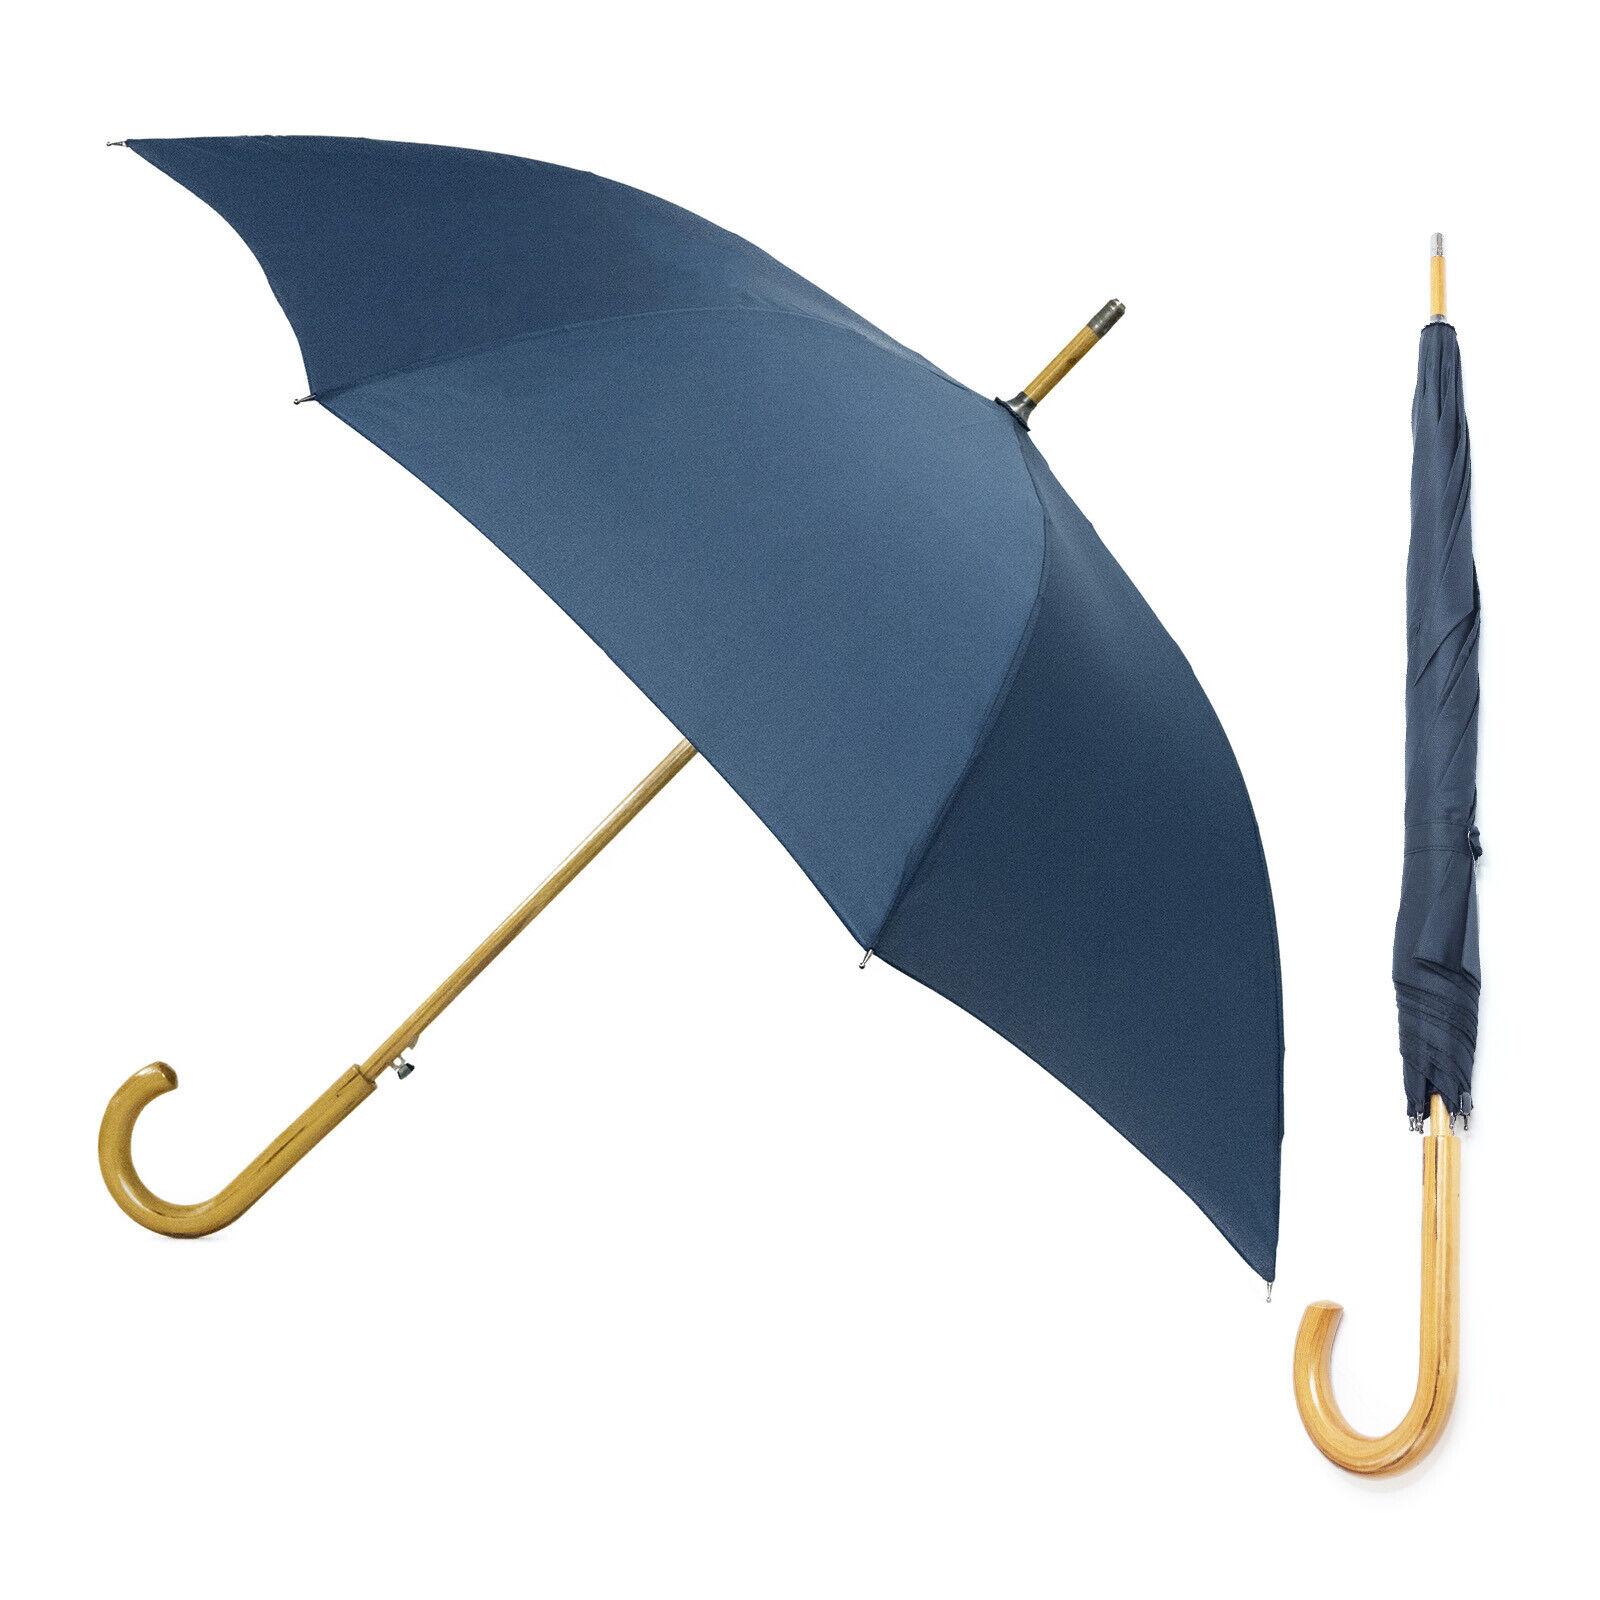 Unisex Windproof Walking Umbrella With Strong Fibreglass Ribs Wooden Handle